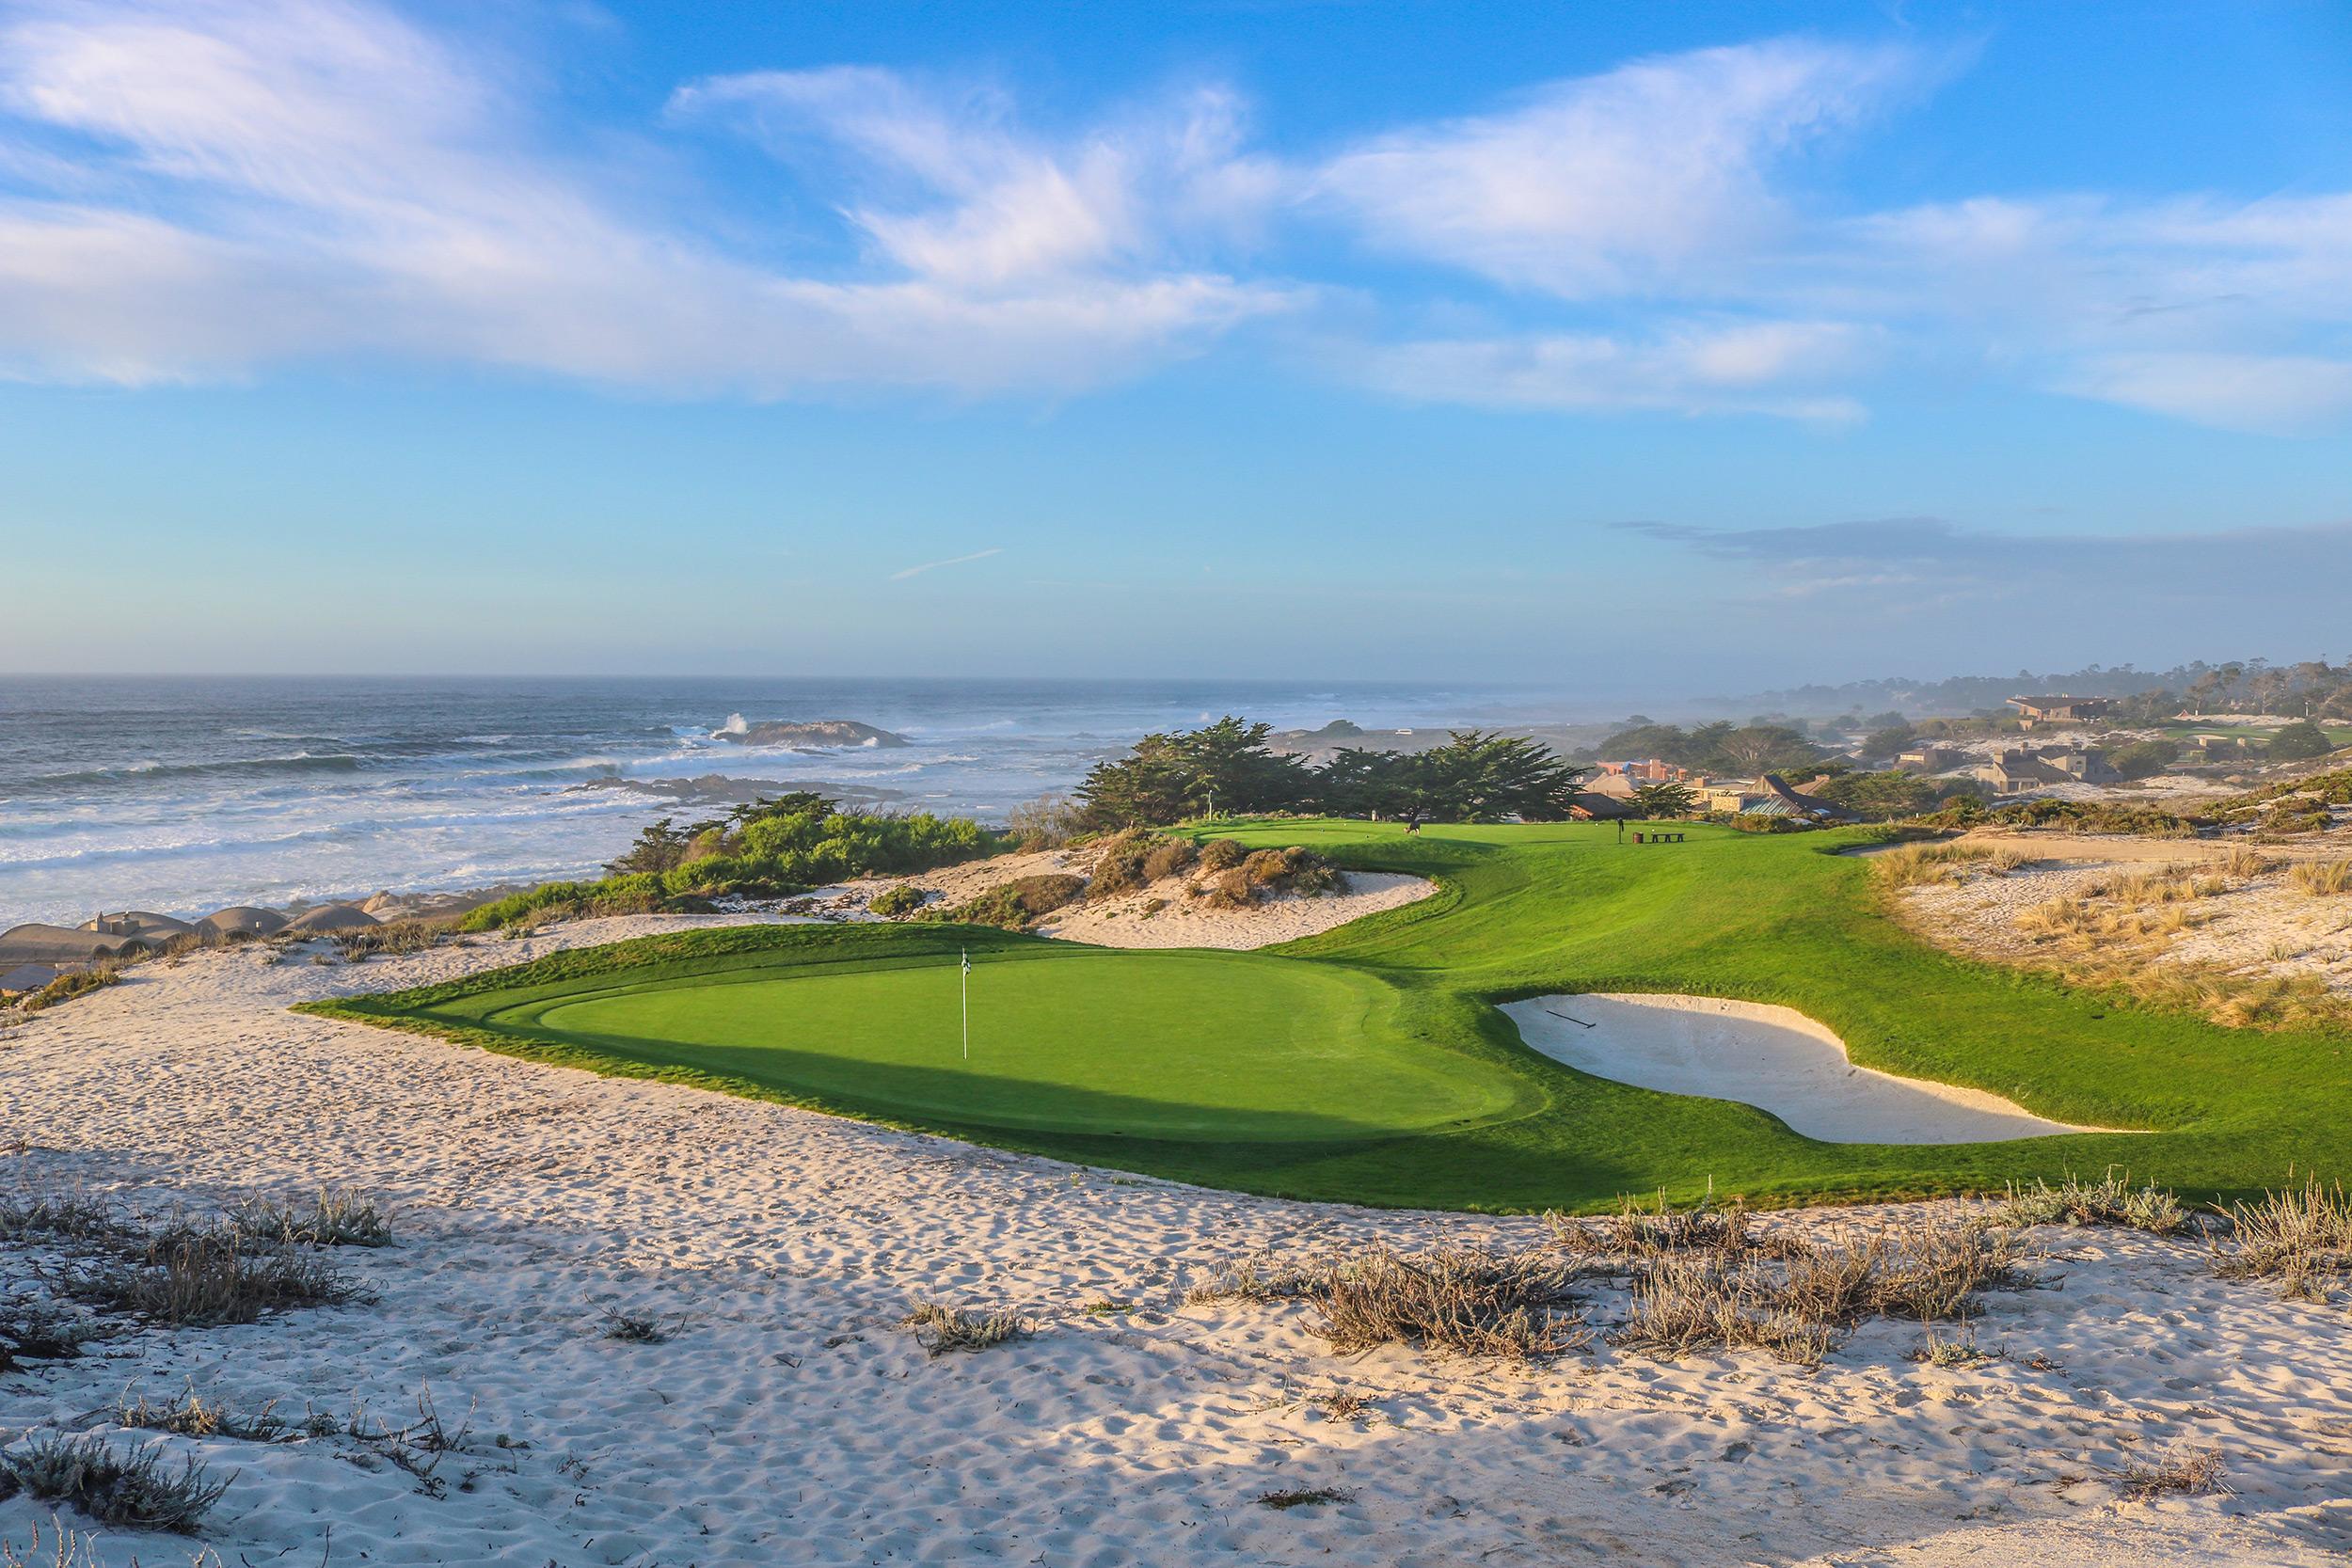 Spygl Hill Golf Course